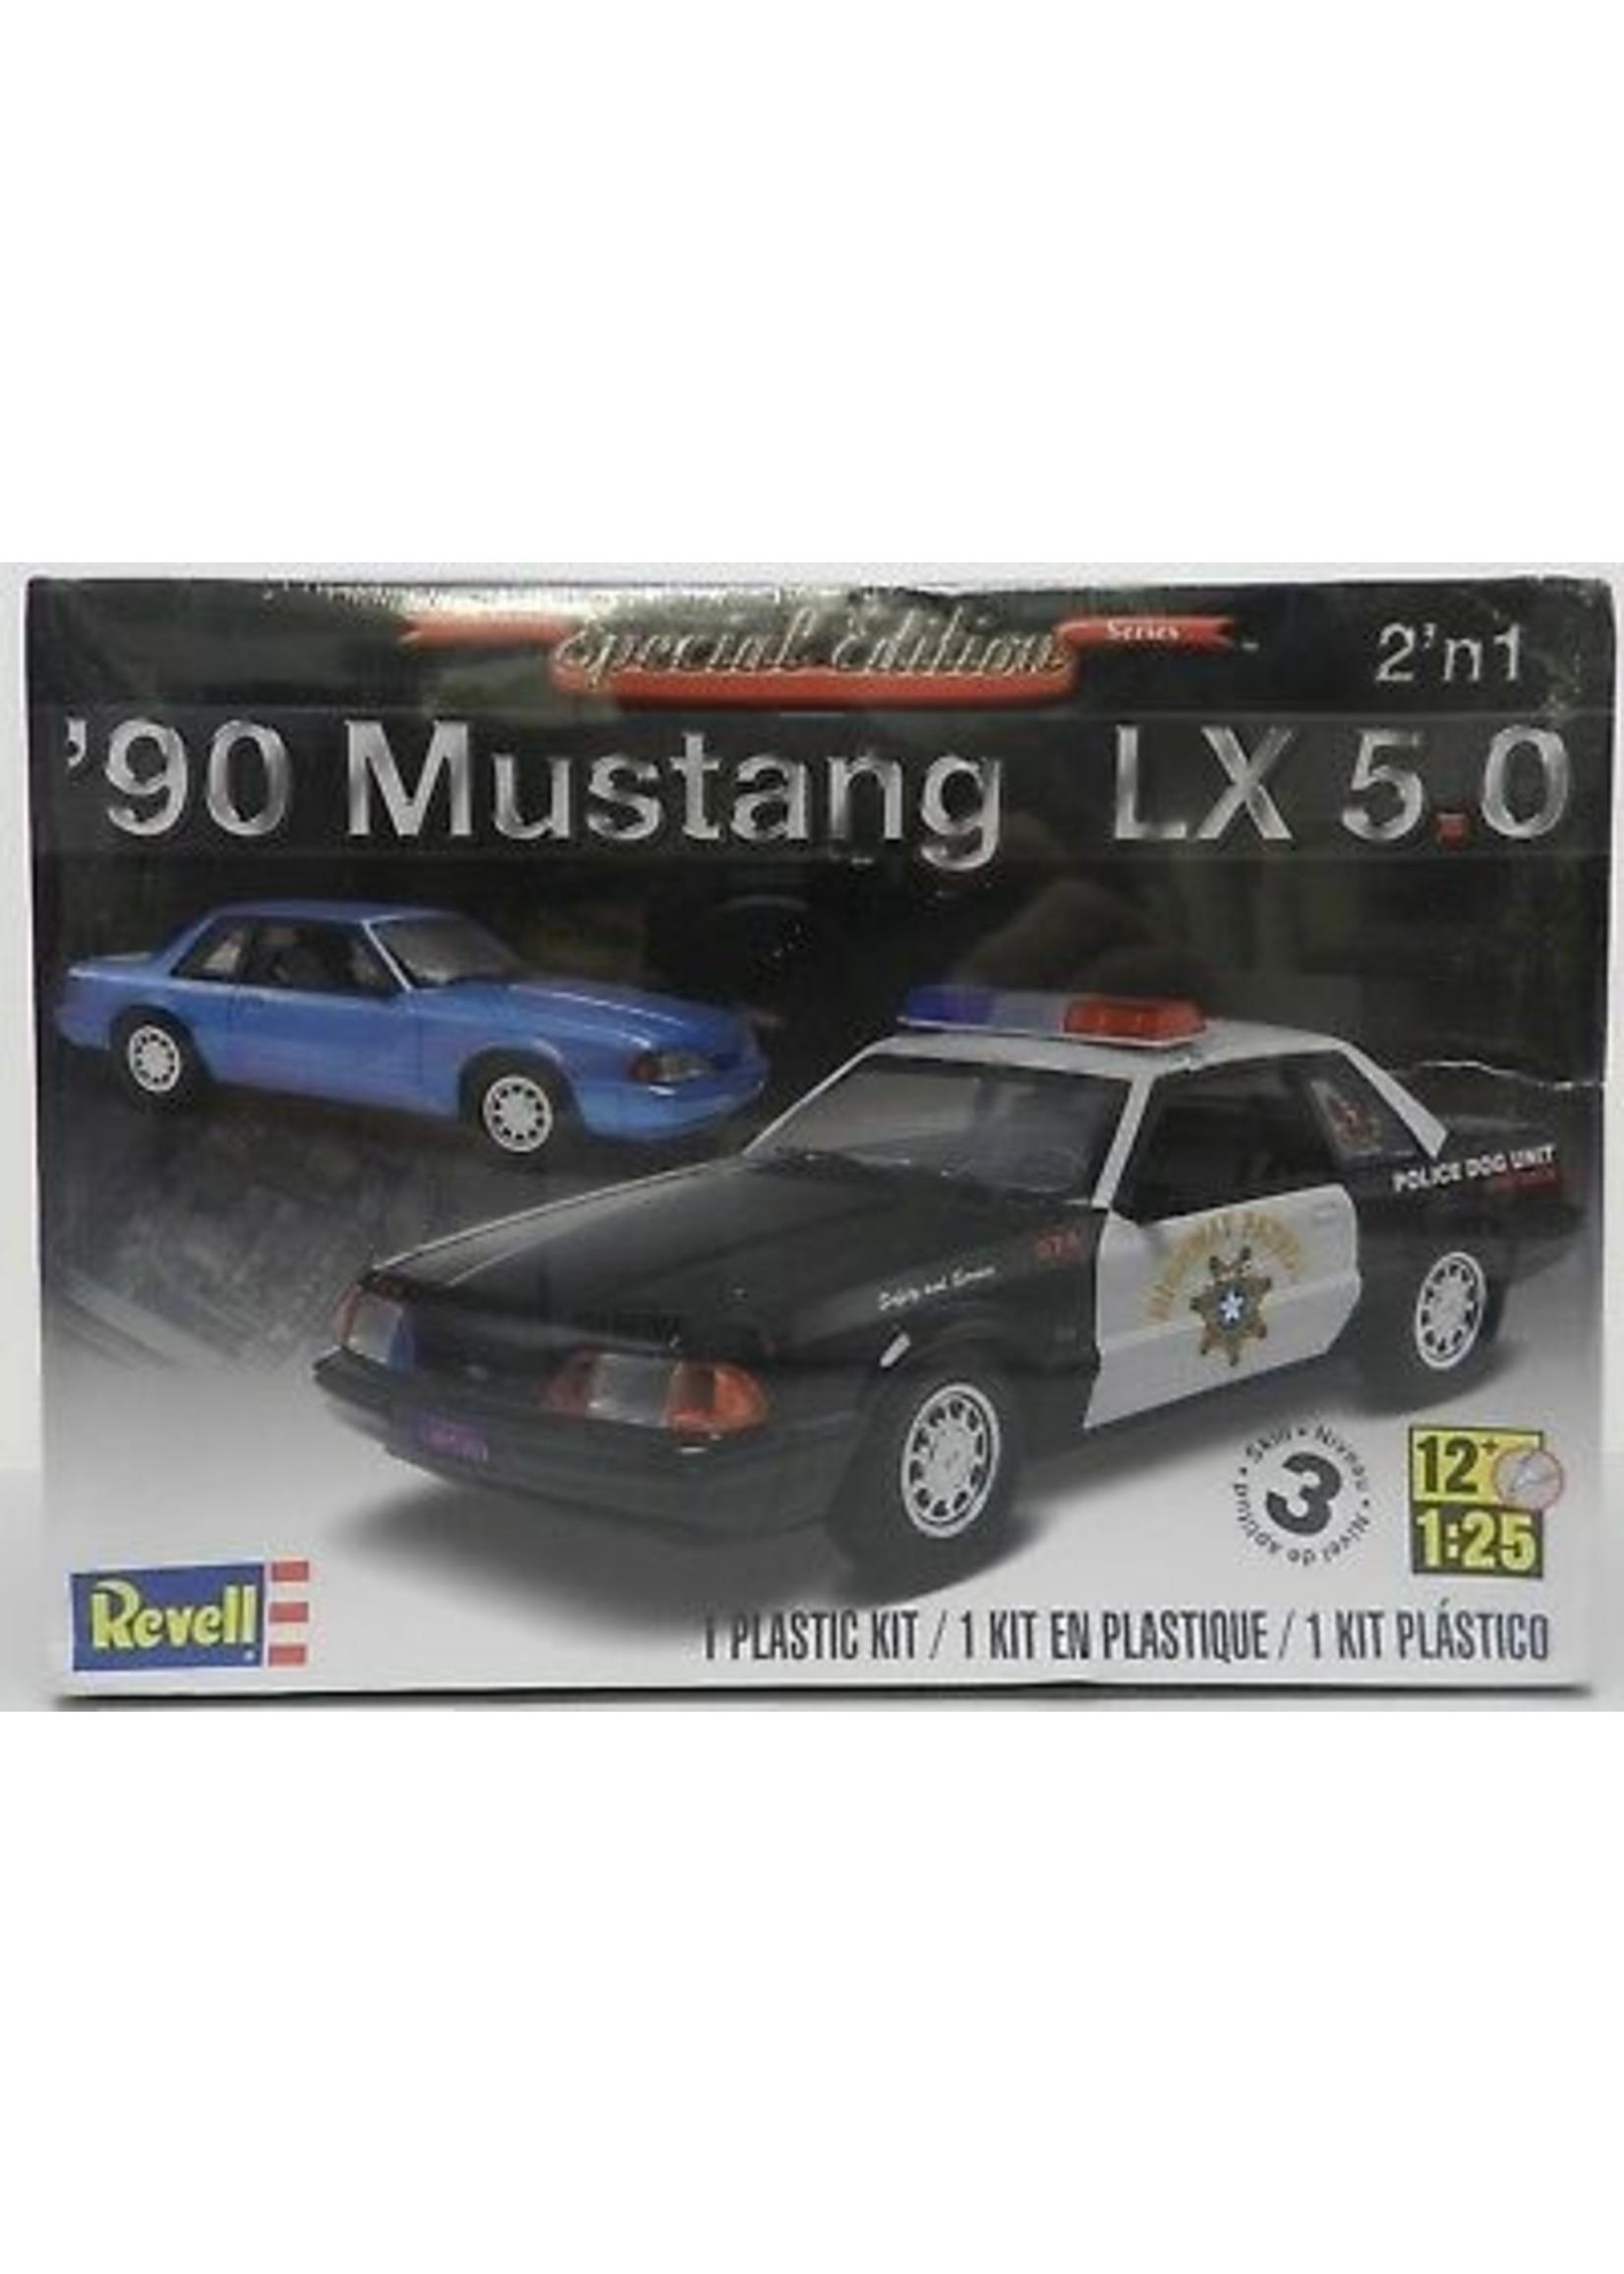 Model Kit: '92 Mustang LX 5.0 2n1 1/25